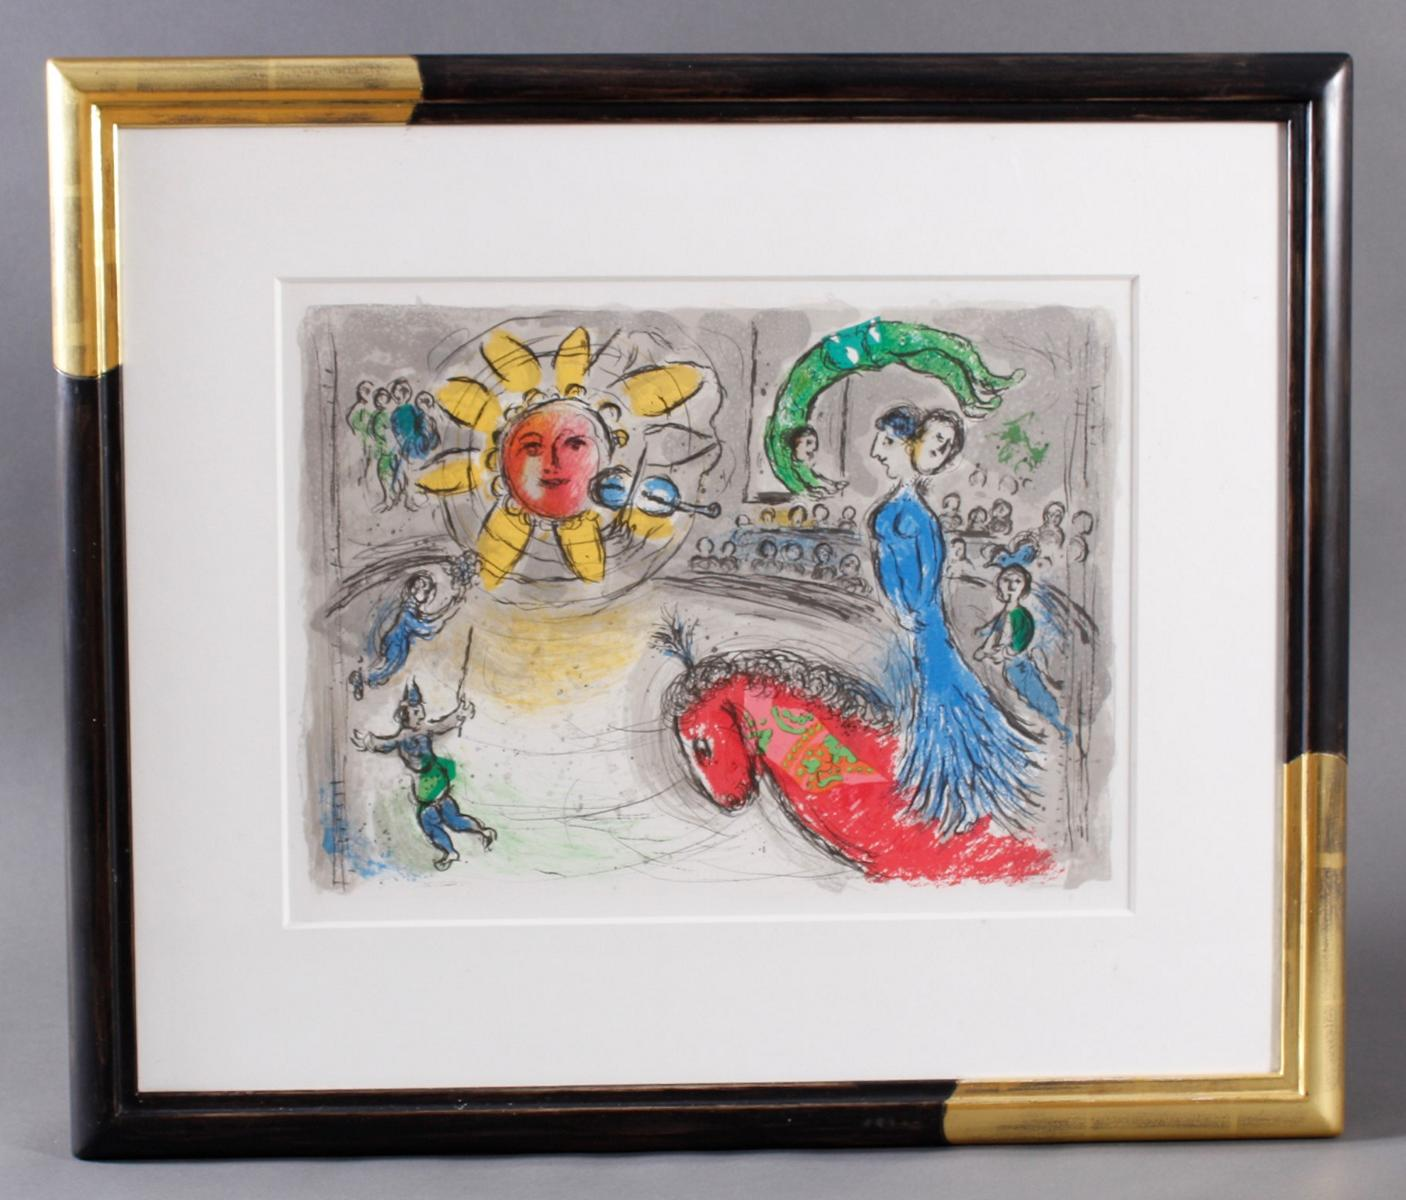 Chagall, Marc 1887 – 1985